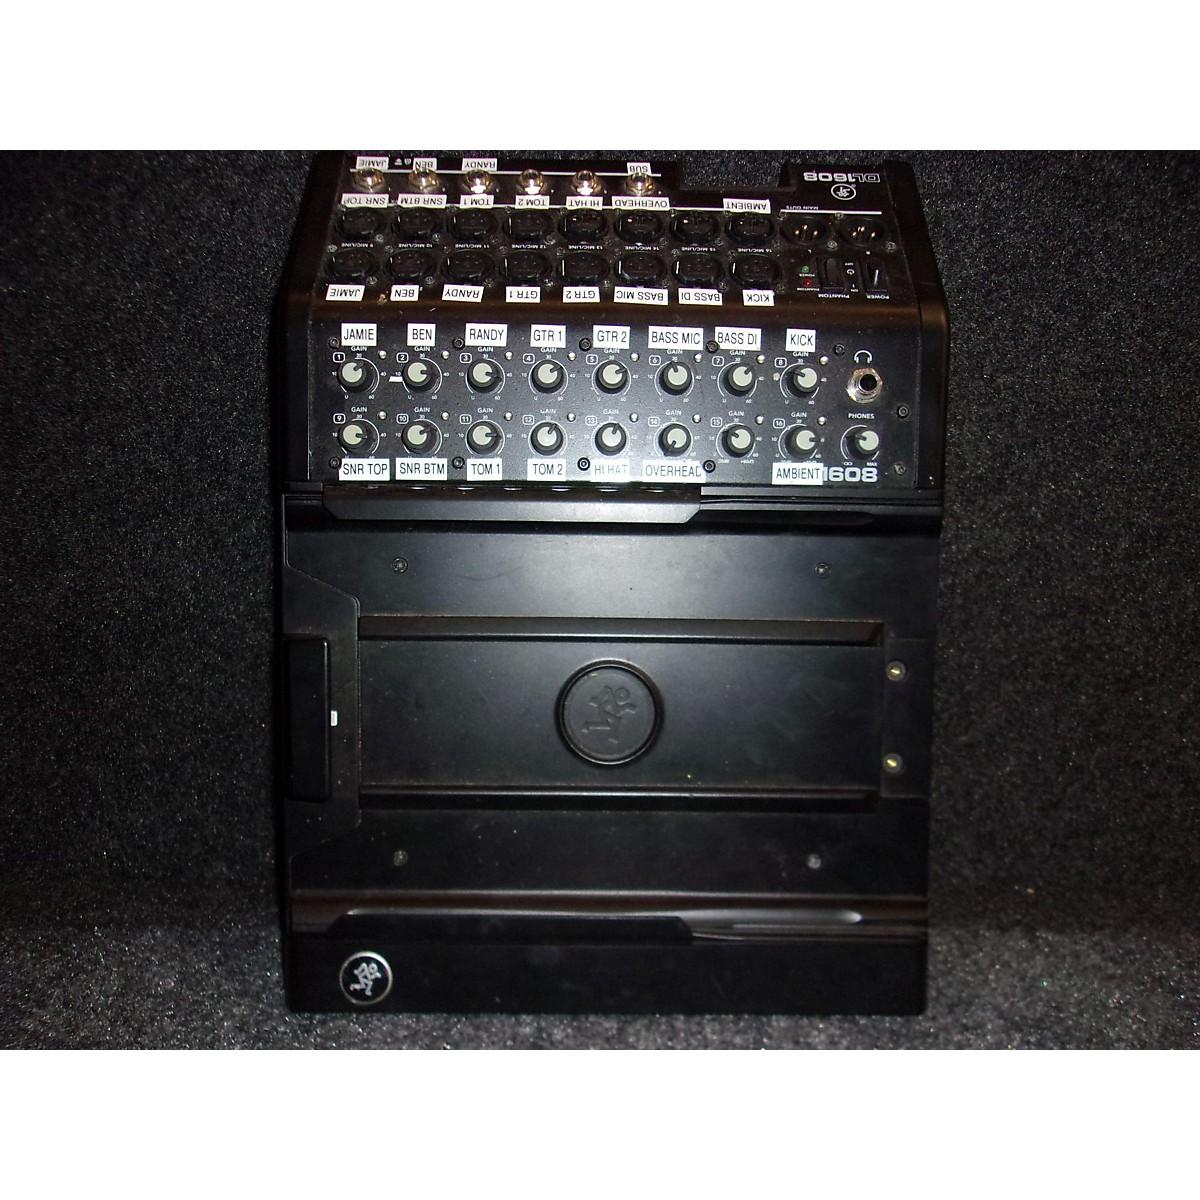 Mackie DL1608 Digital Mixer